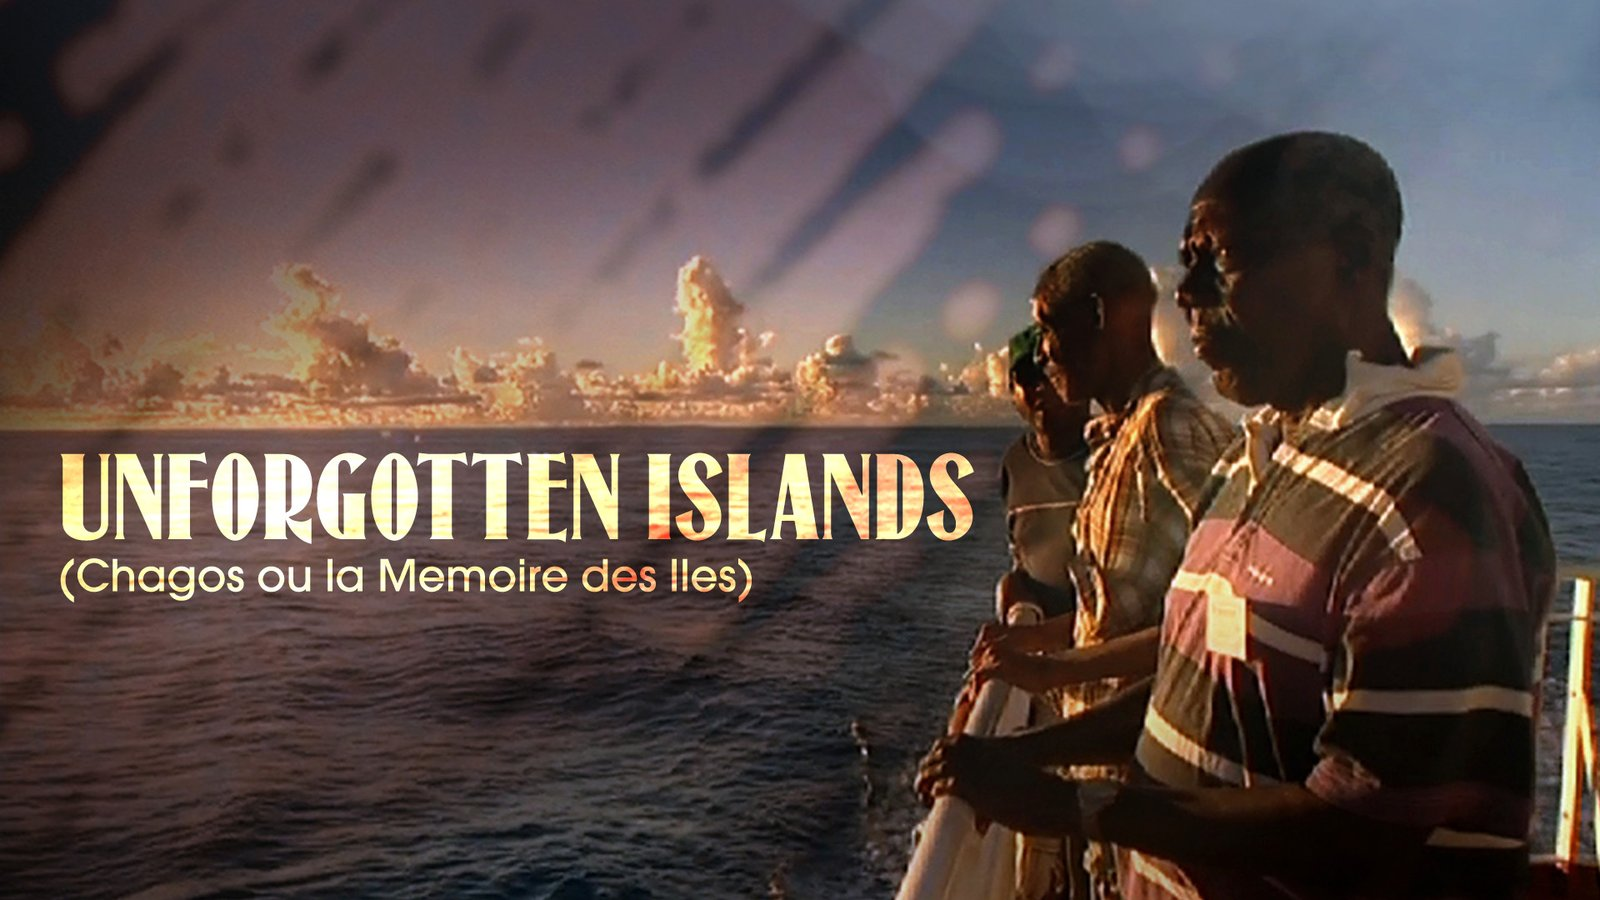 Unforgotten Islands (Chagos Ou la Memoire des Iles)